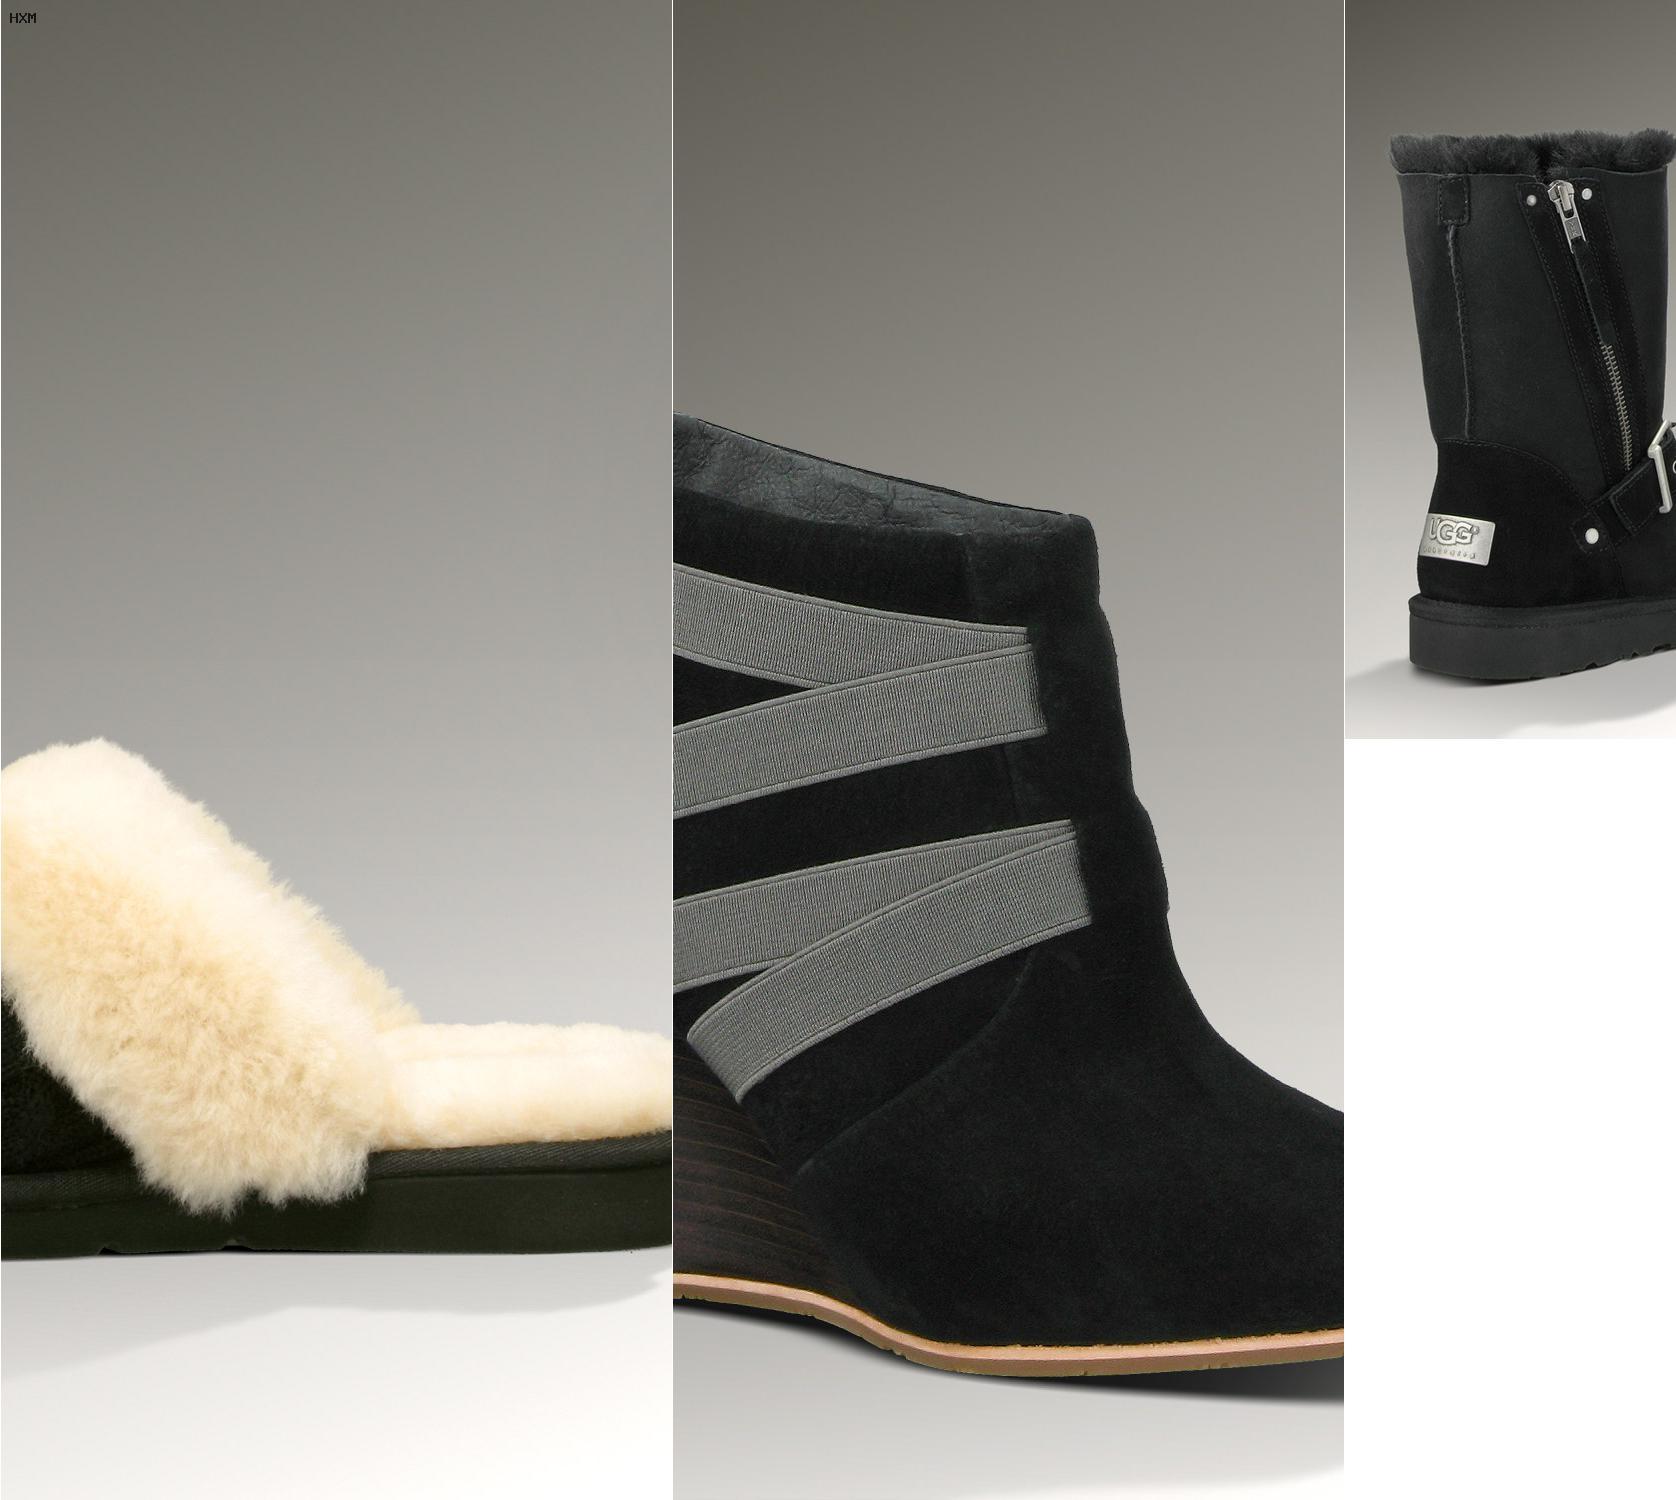 rivenditori scarpe ugg torino